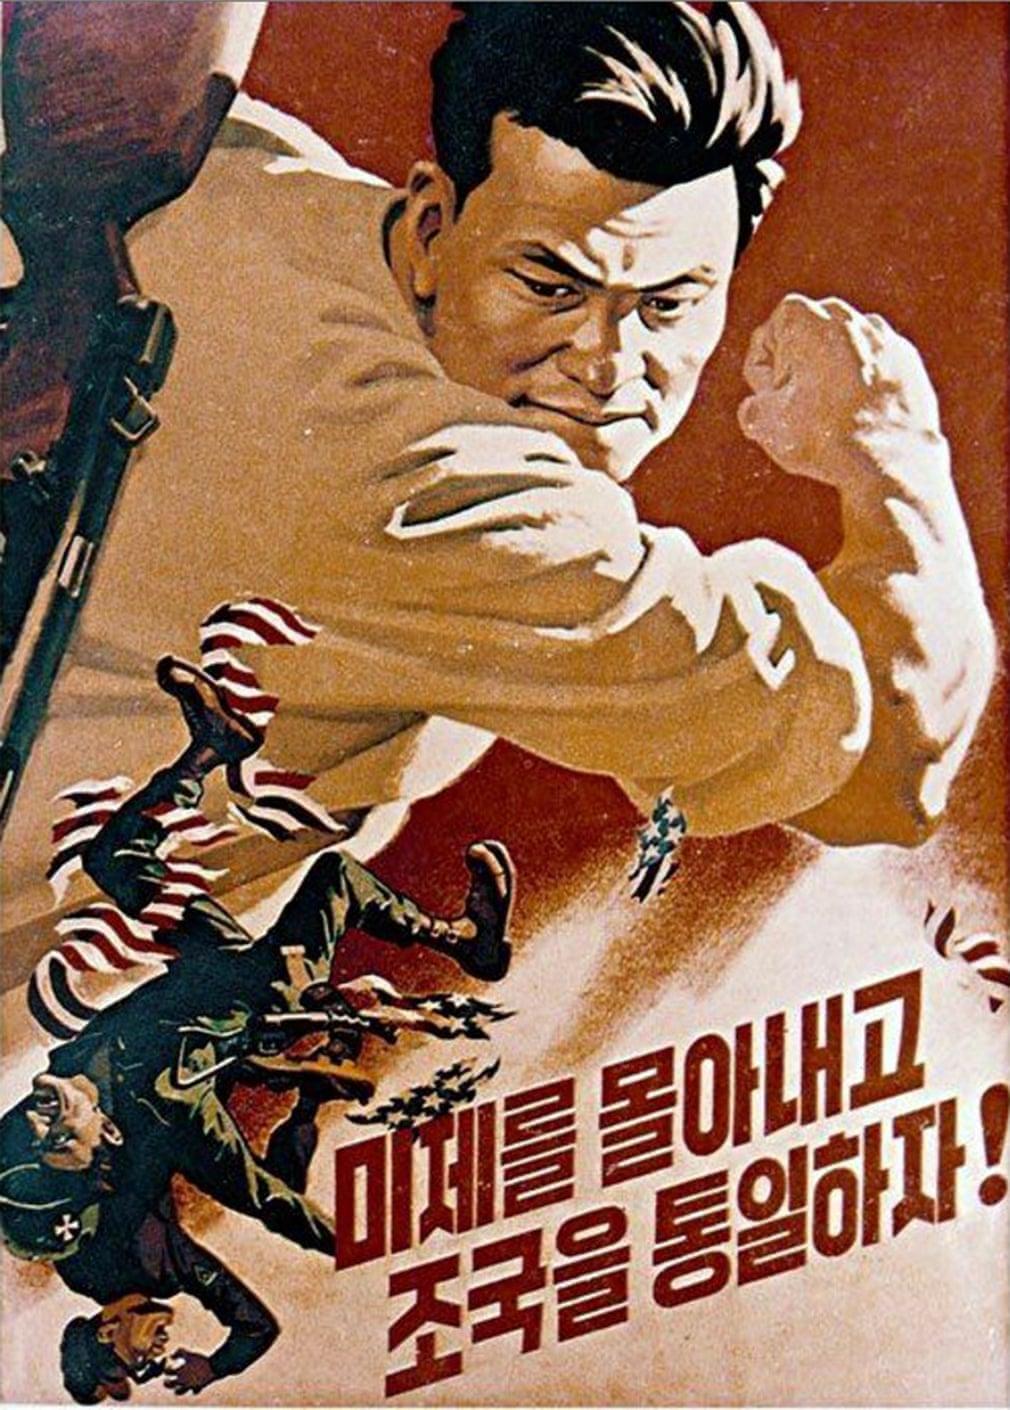 Póster de Corea del Norte, titulado